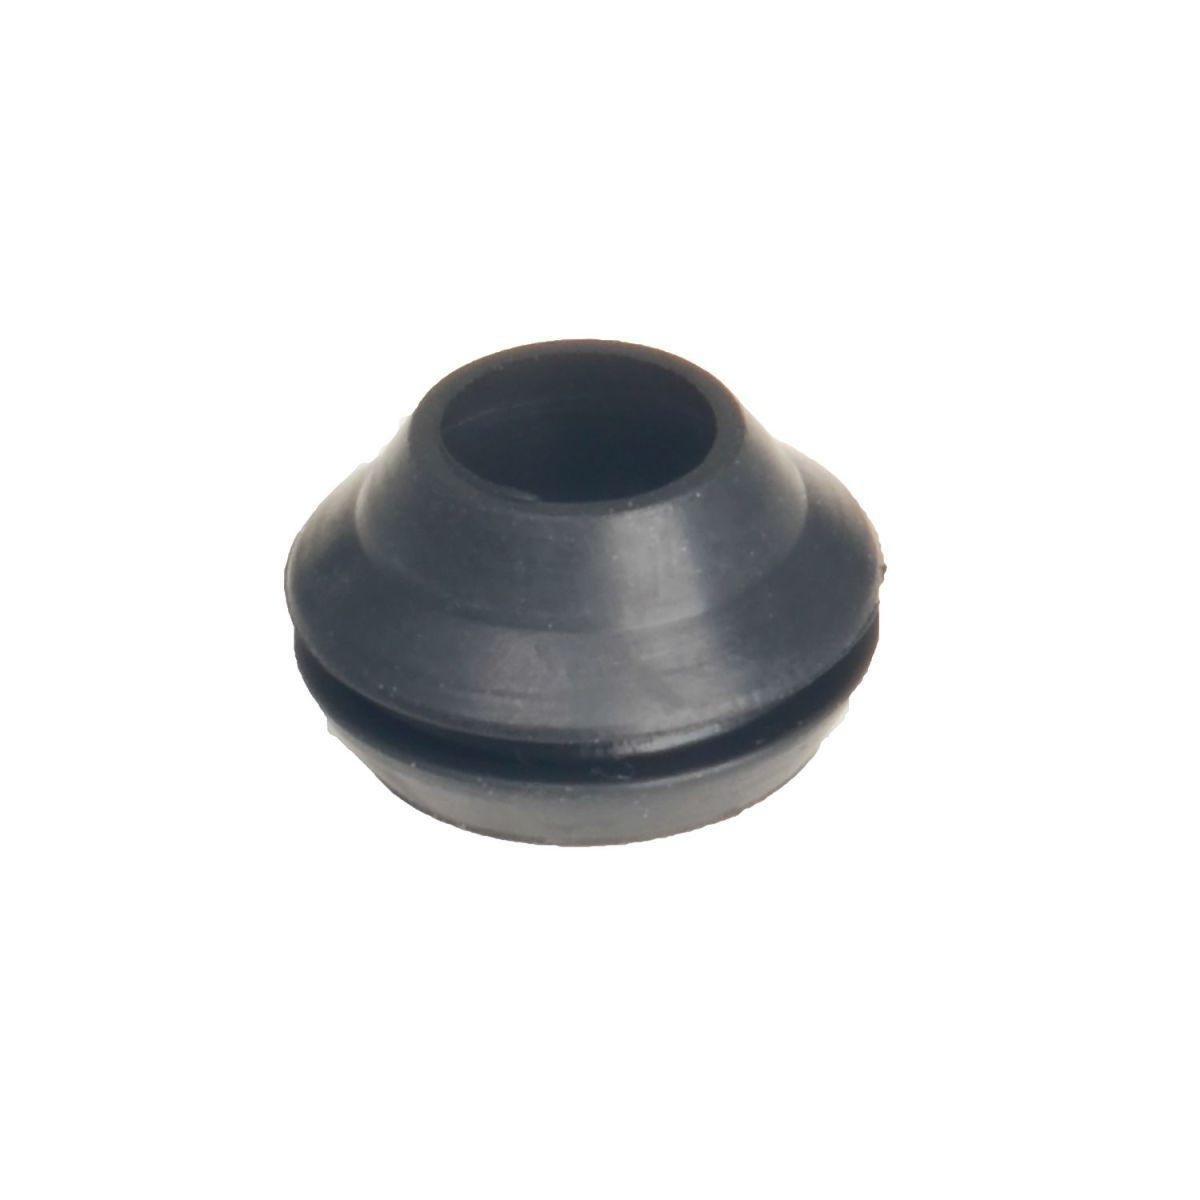 Bunn 26356.0000 Bunn Shaft Seal